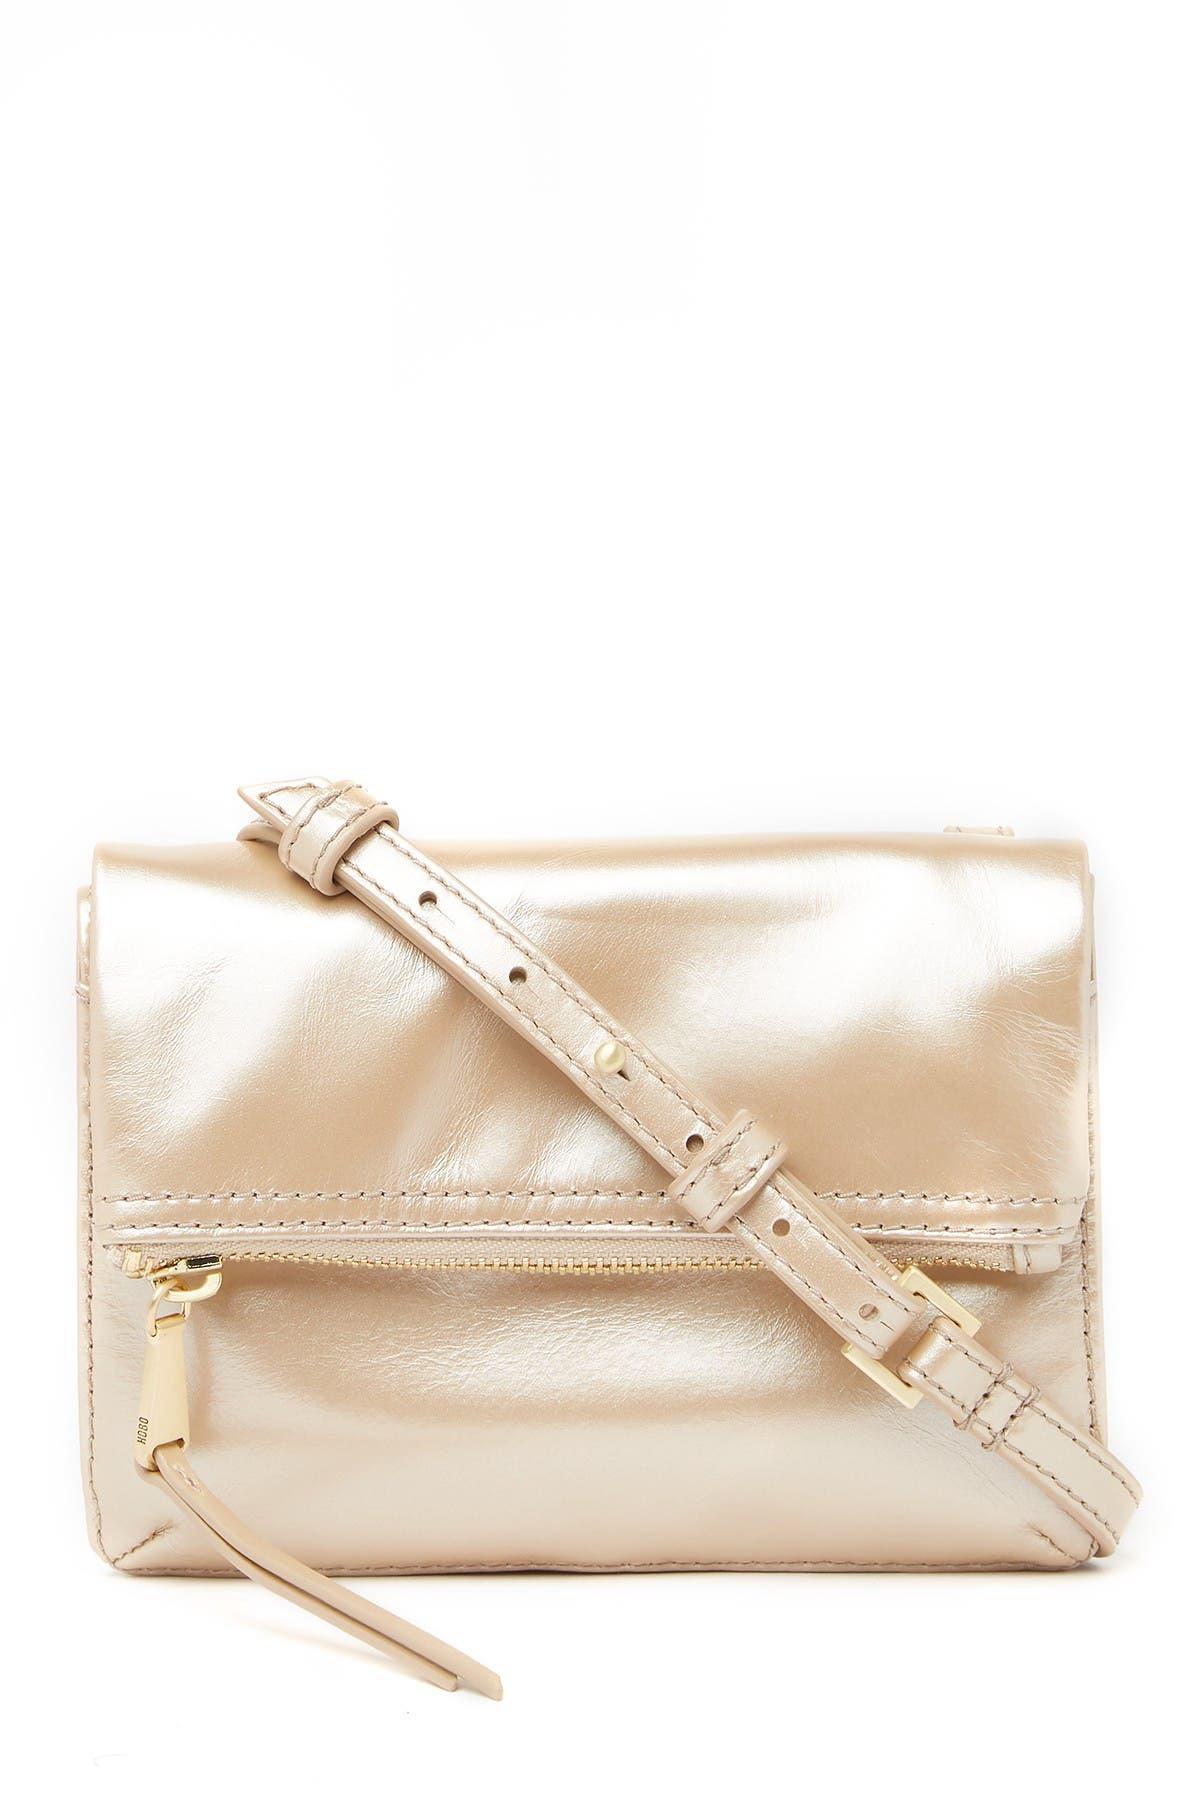 Image of Hobo Glade Leather Crossbody Bag